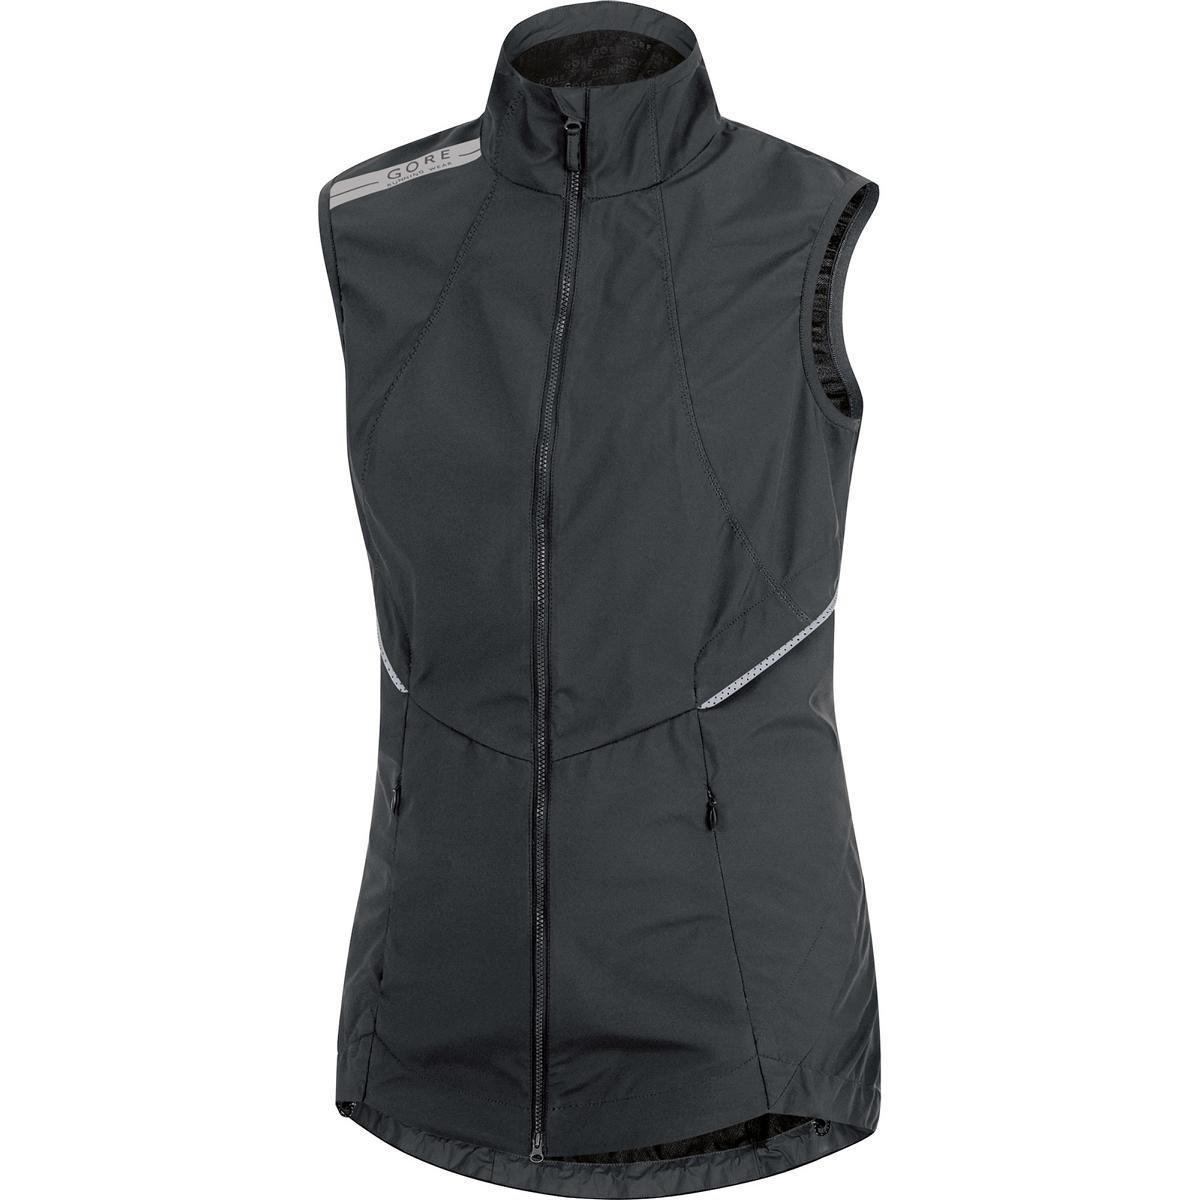 GORE WEAR Damen Weste Air Wndstopper Active Shell Vest